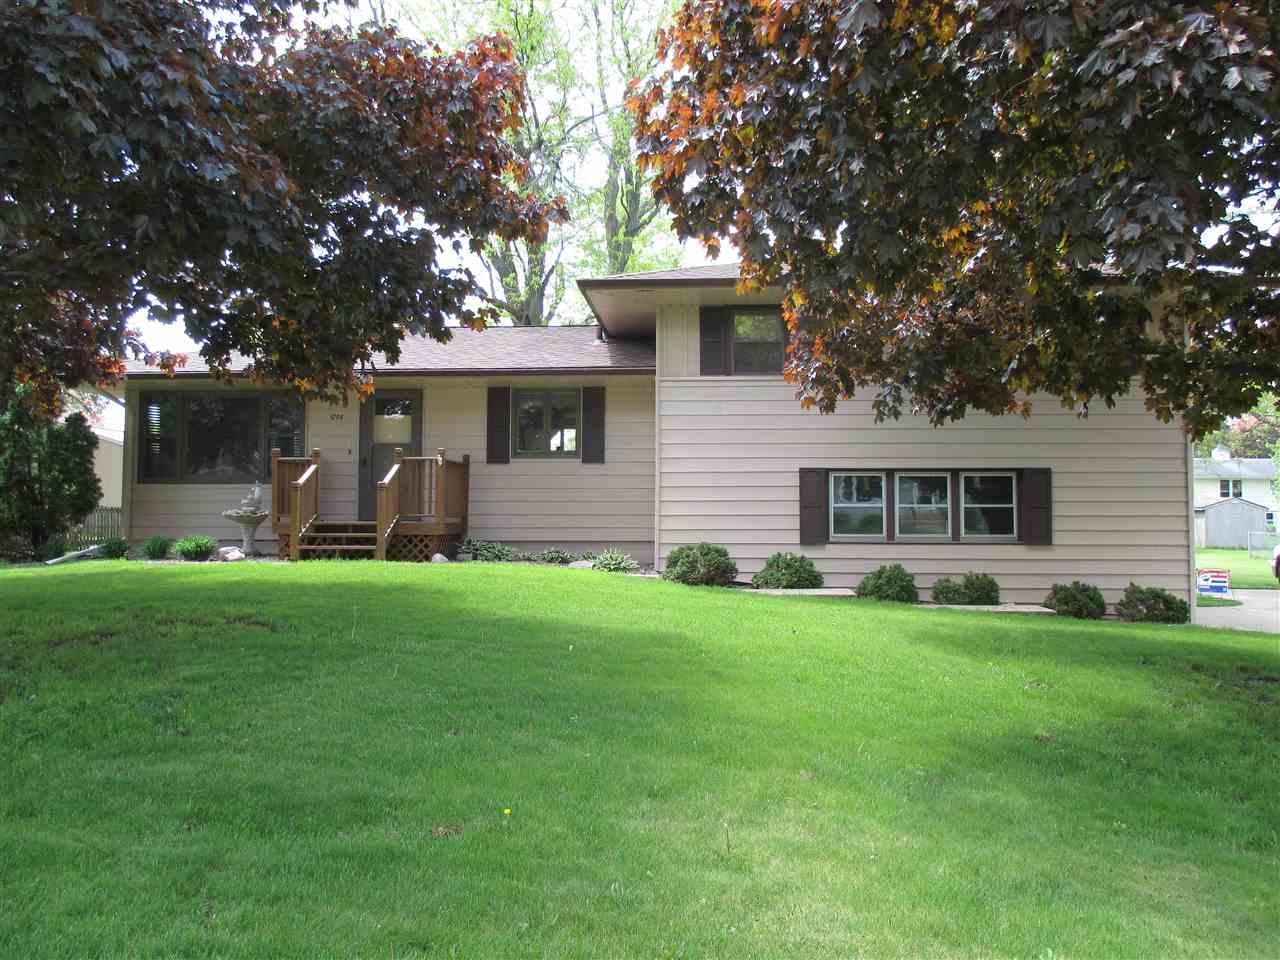 Real Estate for Sale, ListingId: 32744930, Orion,IL61273